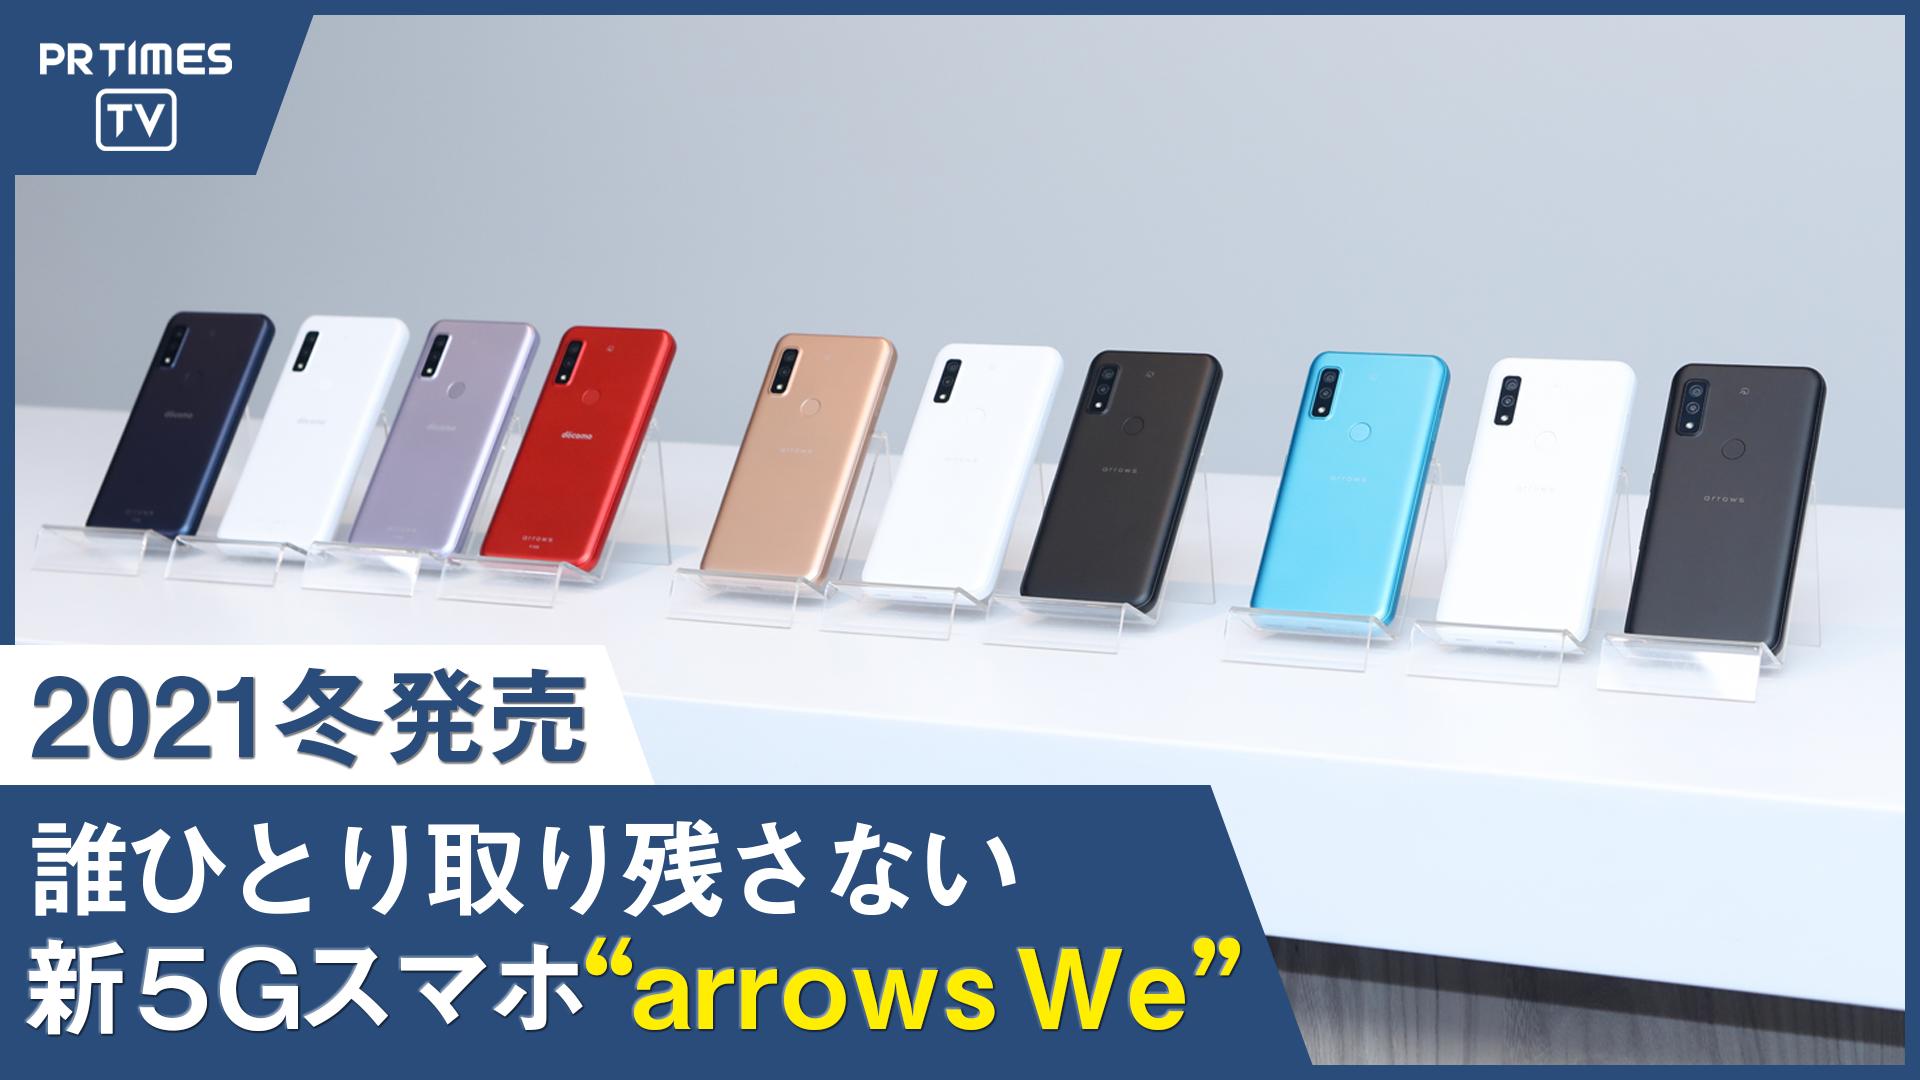 FCNTから最新5Gスマートフォン「arrows We」誕生!NTT ドコモ・KDDI・ソフトバンクから今冬発売予定